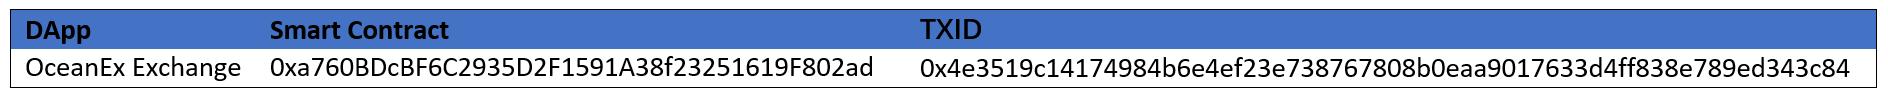 b7a6c8a8-c2fa-4dd7-970b-8fe8aac53e4e-image.png